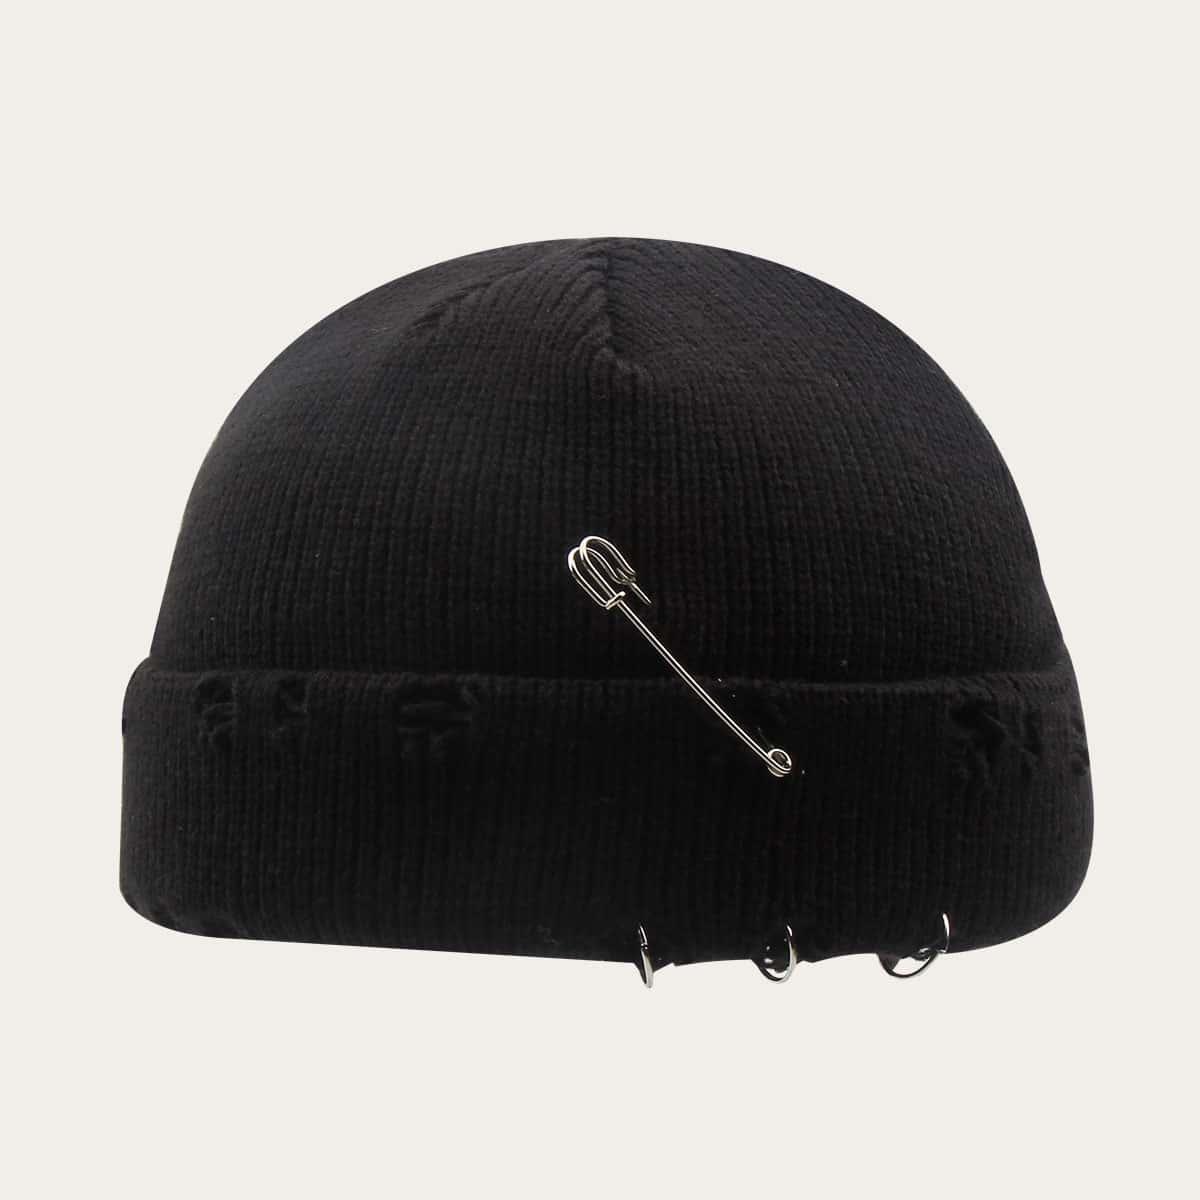 Трикотажная шапка-бини